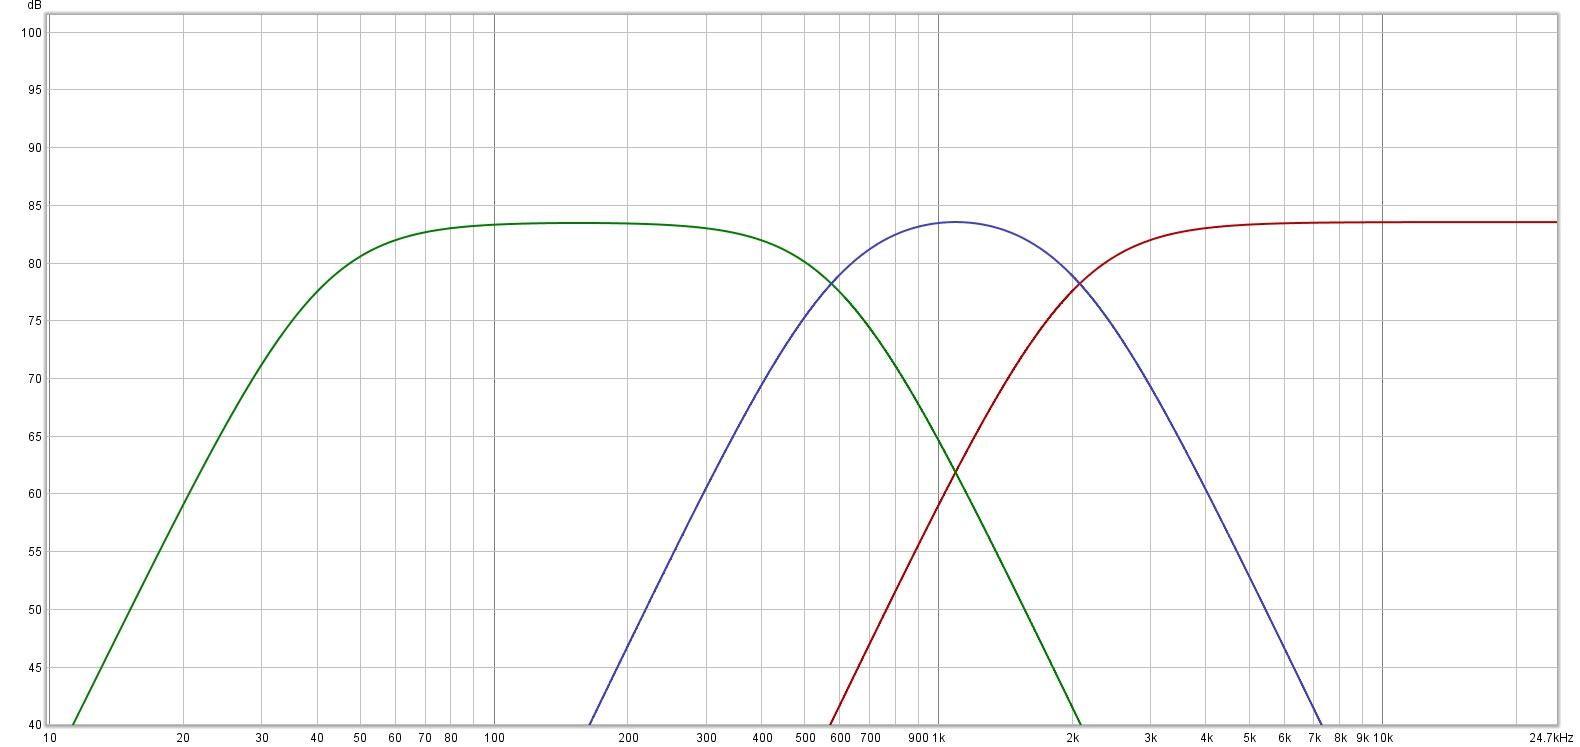 3-Way_X-Over_Filters_600Hz_2000Hz_LR24_FR_cut_off_40Hz_LR24.jpg